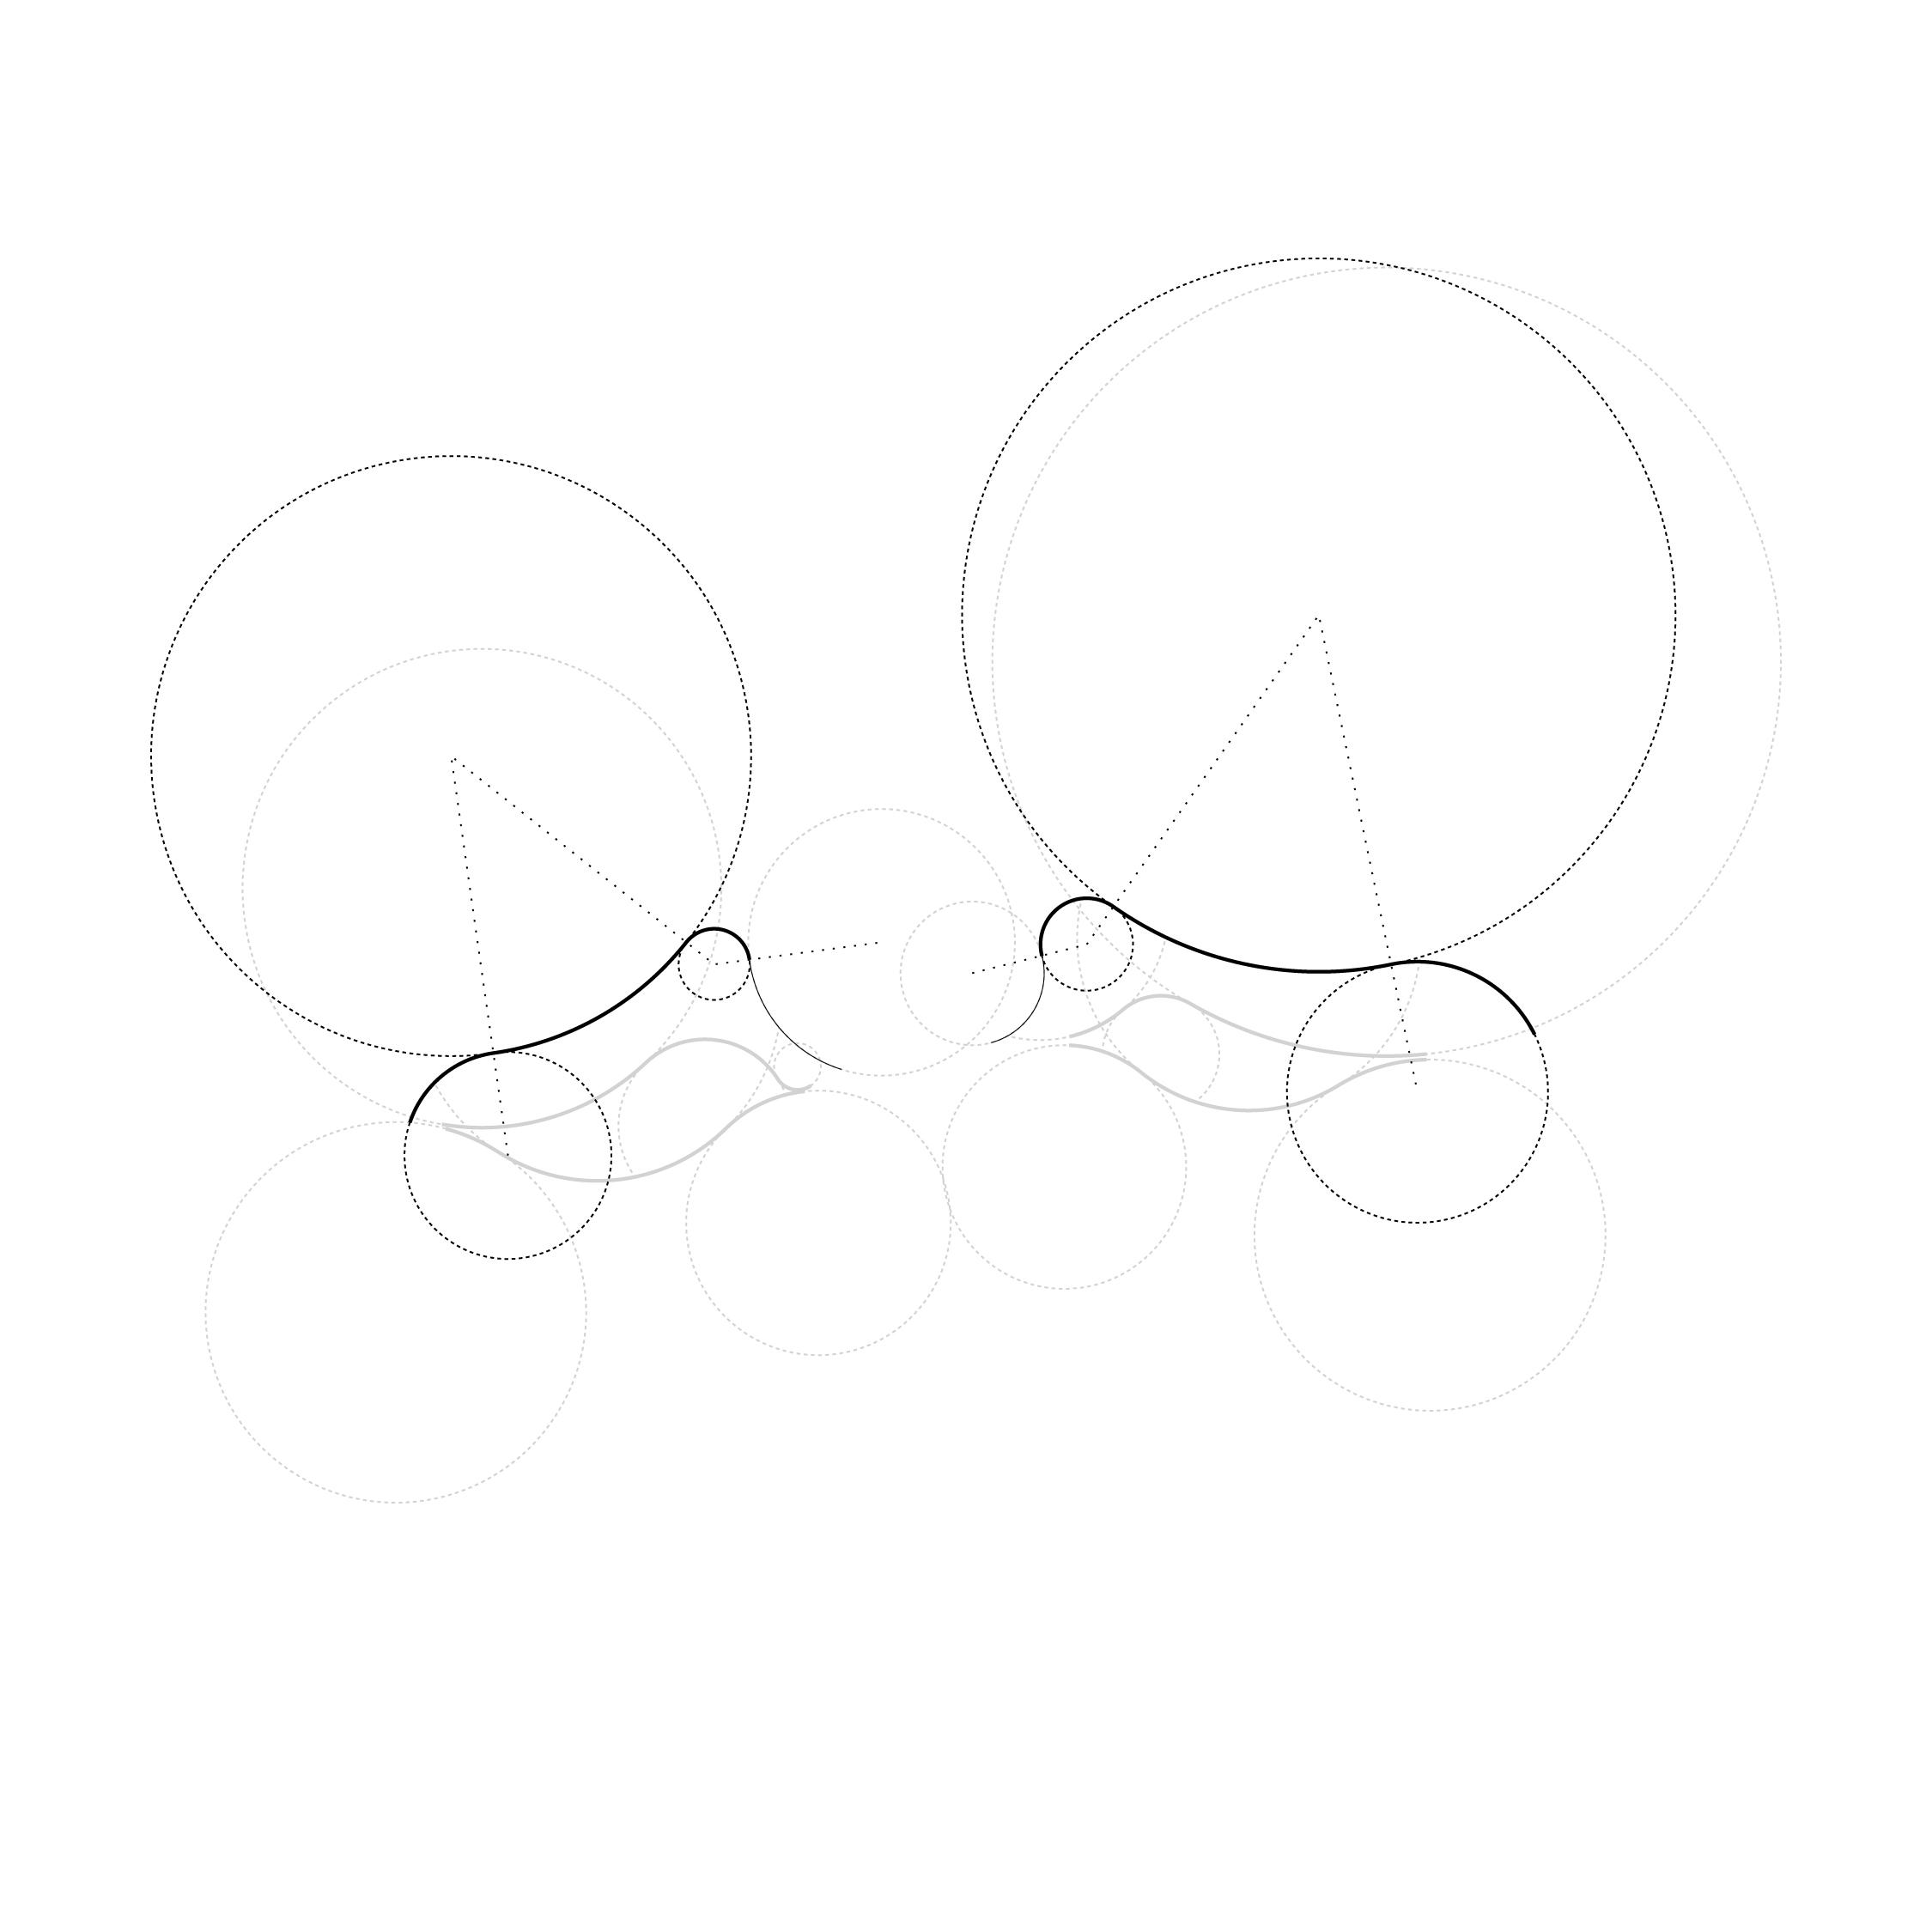 140913 eye-lips circle anayisys-03.jpg